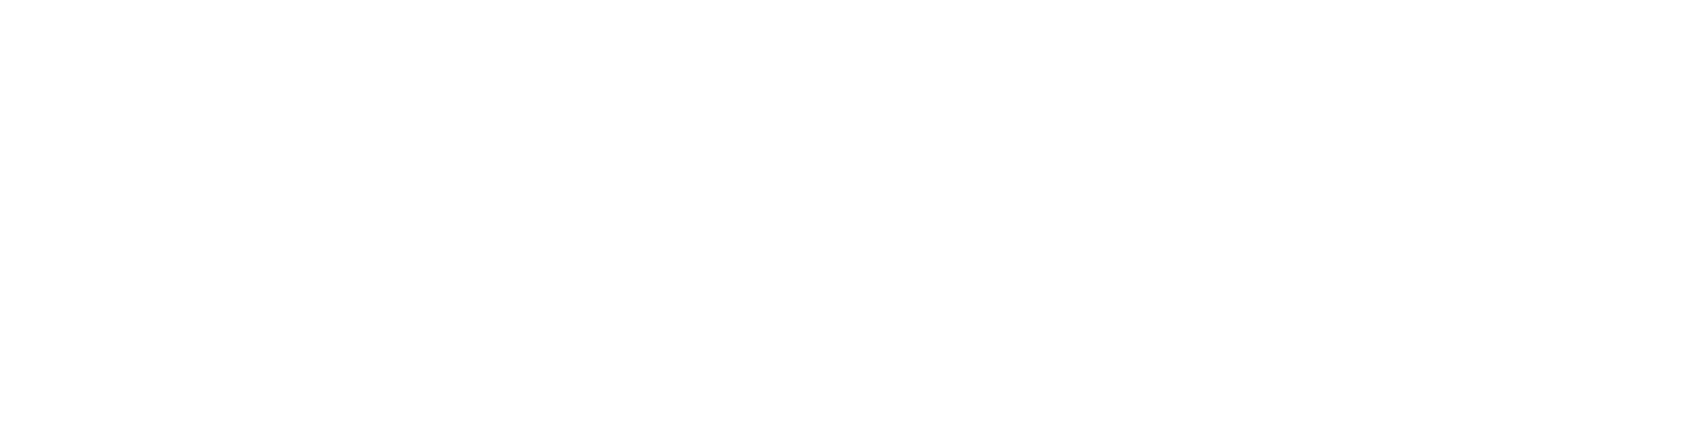 Flagstaff Hill Pharmacy